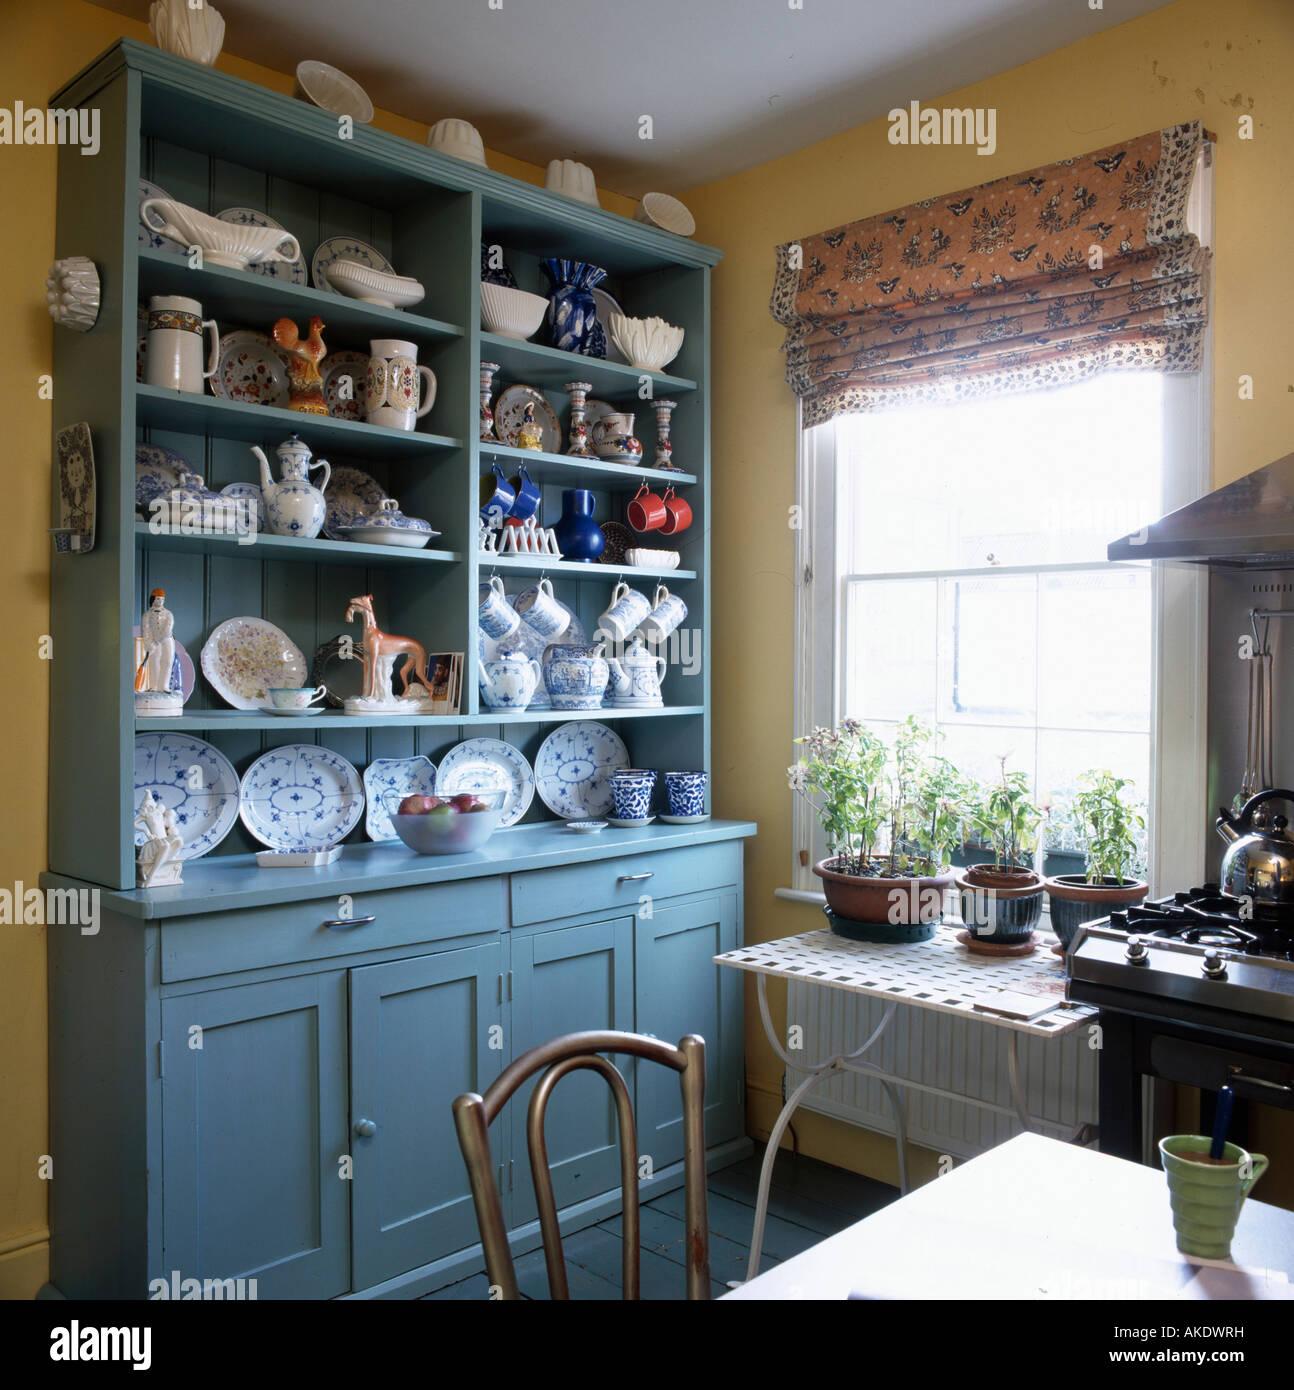 Crockery On Shelves In Kitchen Stock Photos & Crockery On Shelves In ...